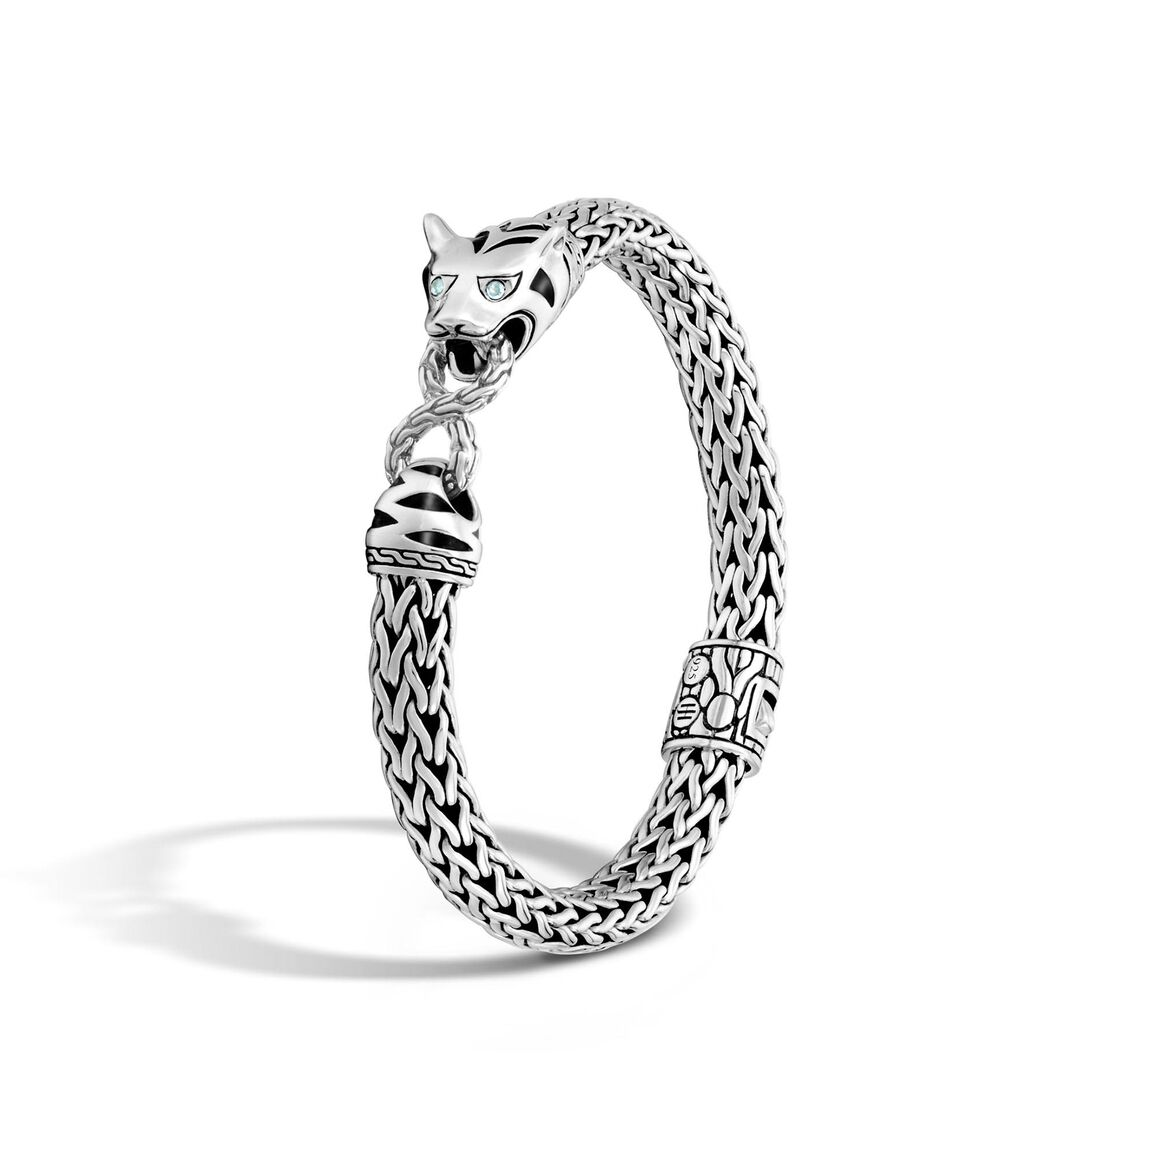 Legends Macan 7.5MM Station Bracelet in Silver